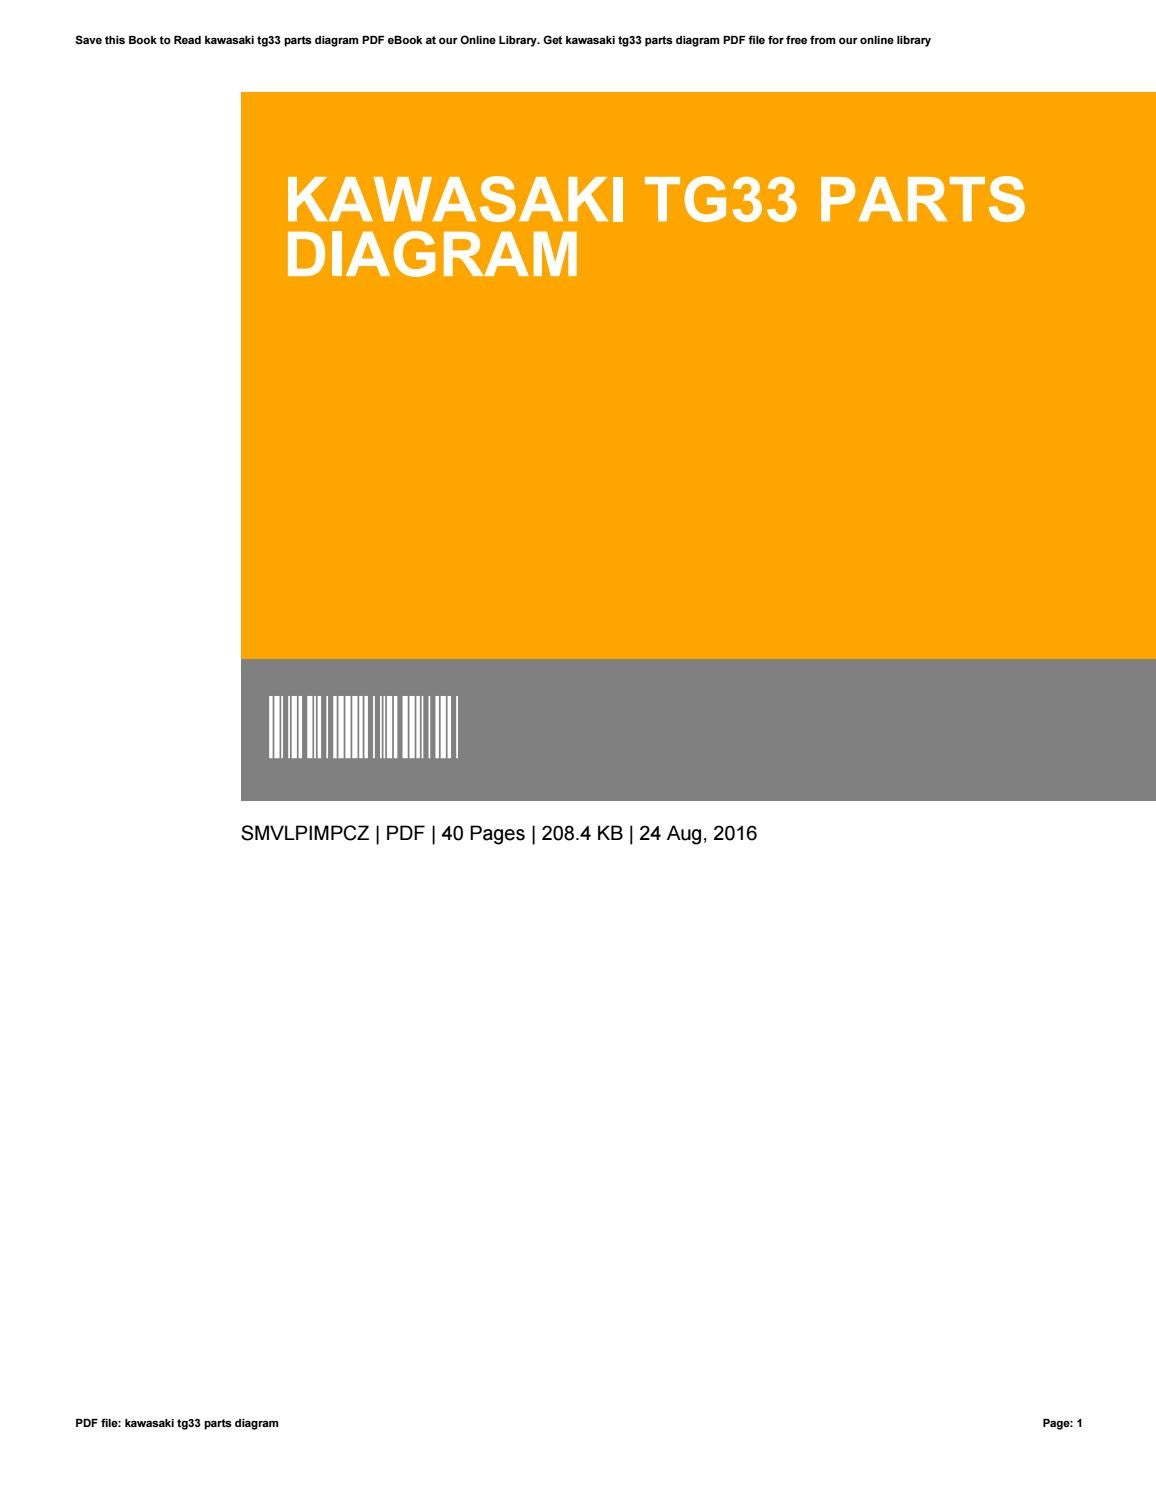 kawasaki tg33 parts diagram by apssdc41 - issuu  issuu